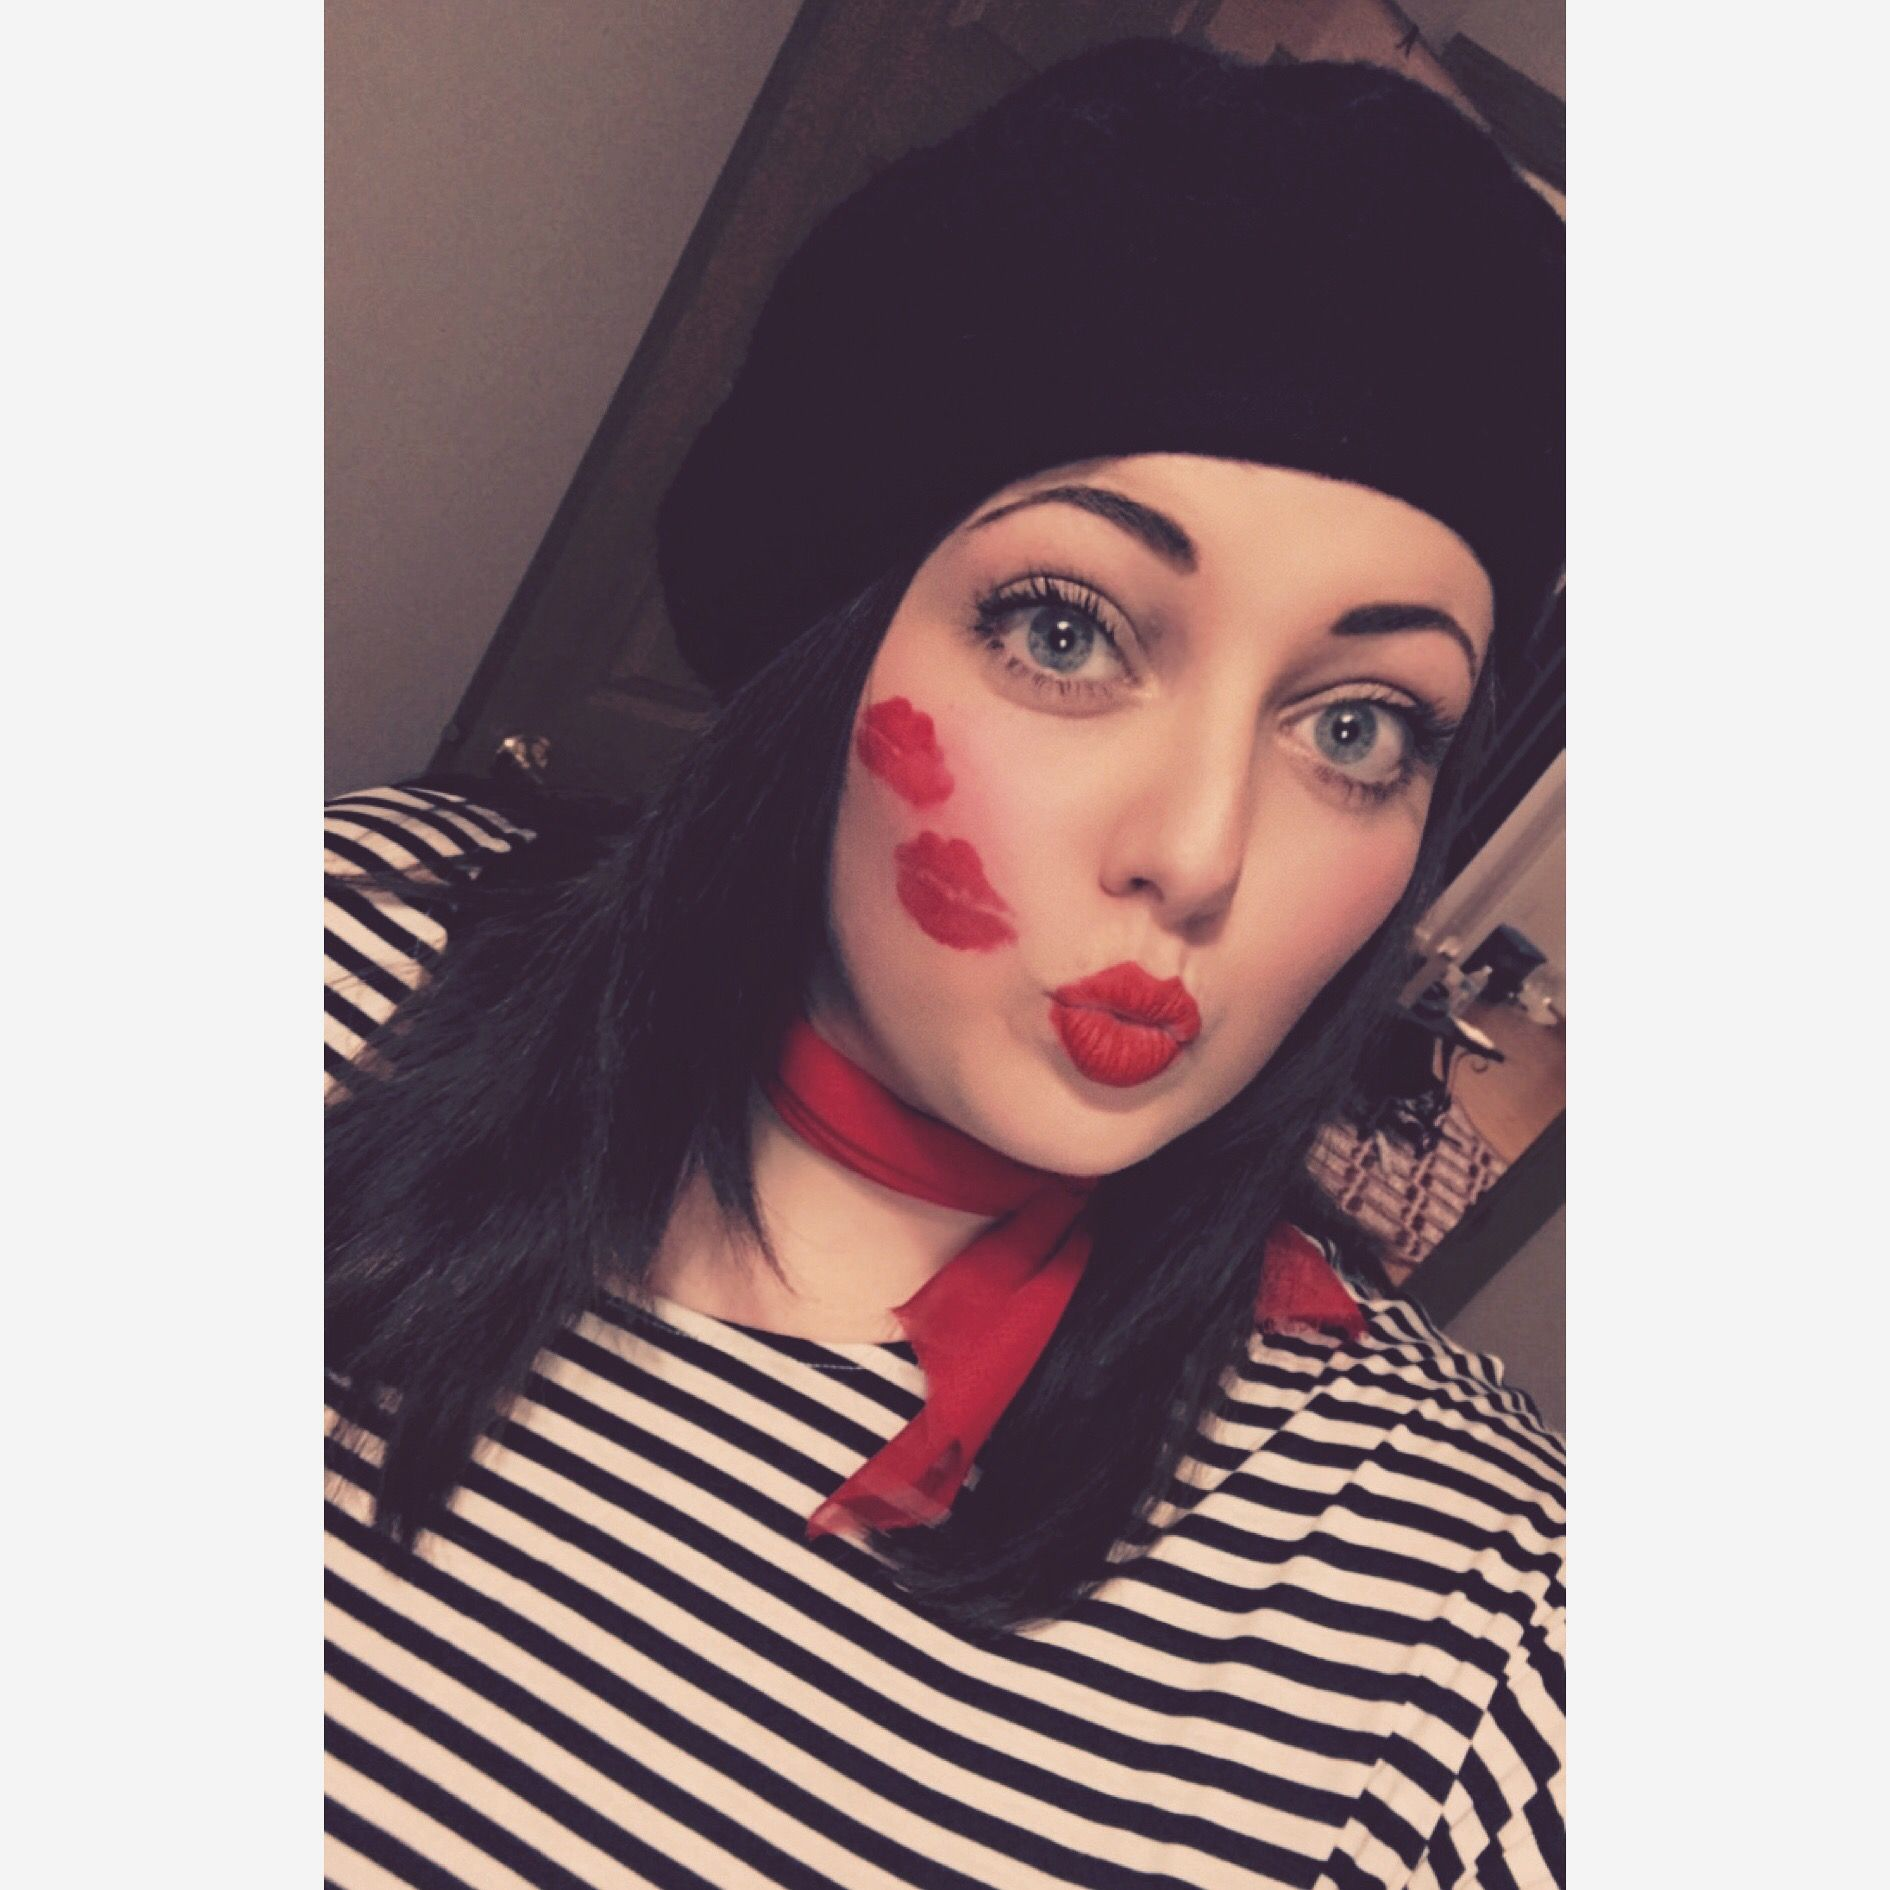 Halloween costume! Punny costume! Pun costume idea! French Kiss Costume #punny #halloween #french #kiss #frenchkiss